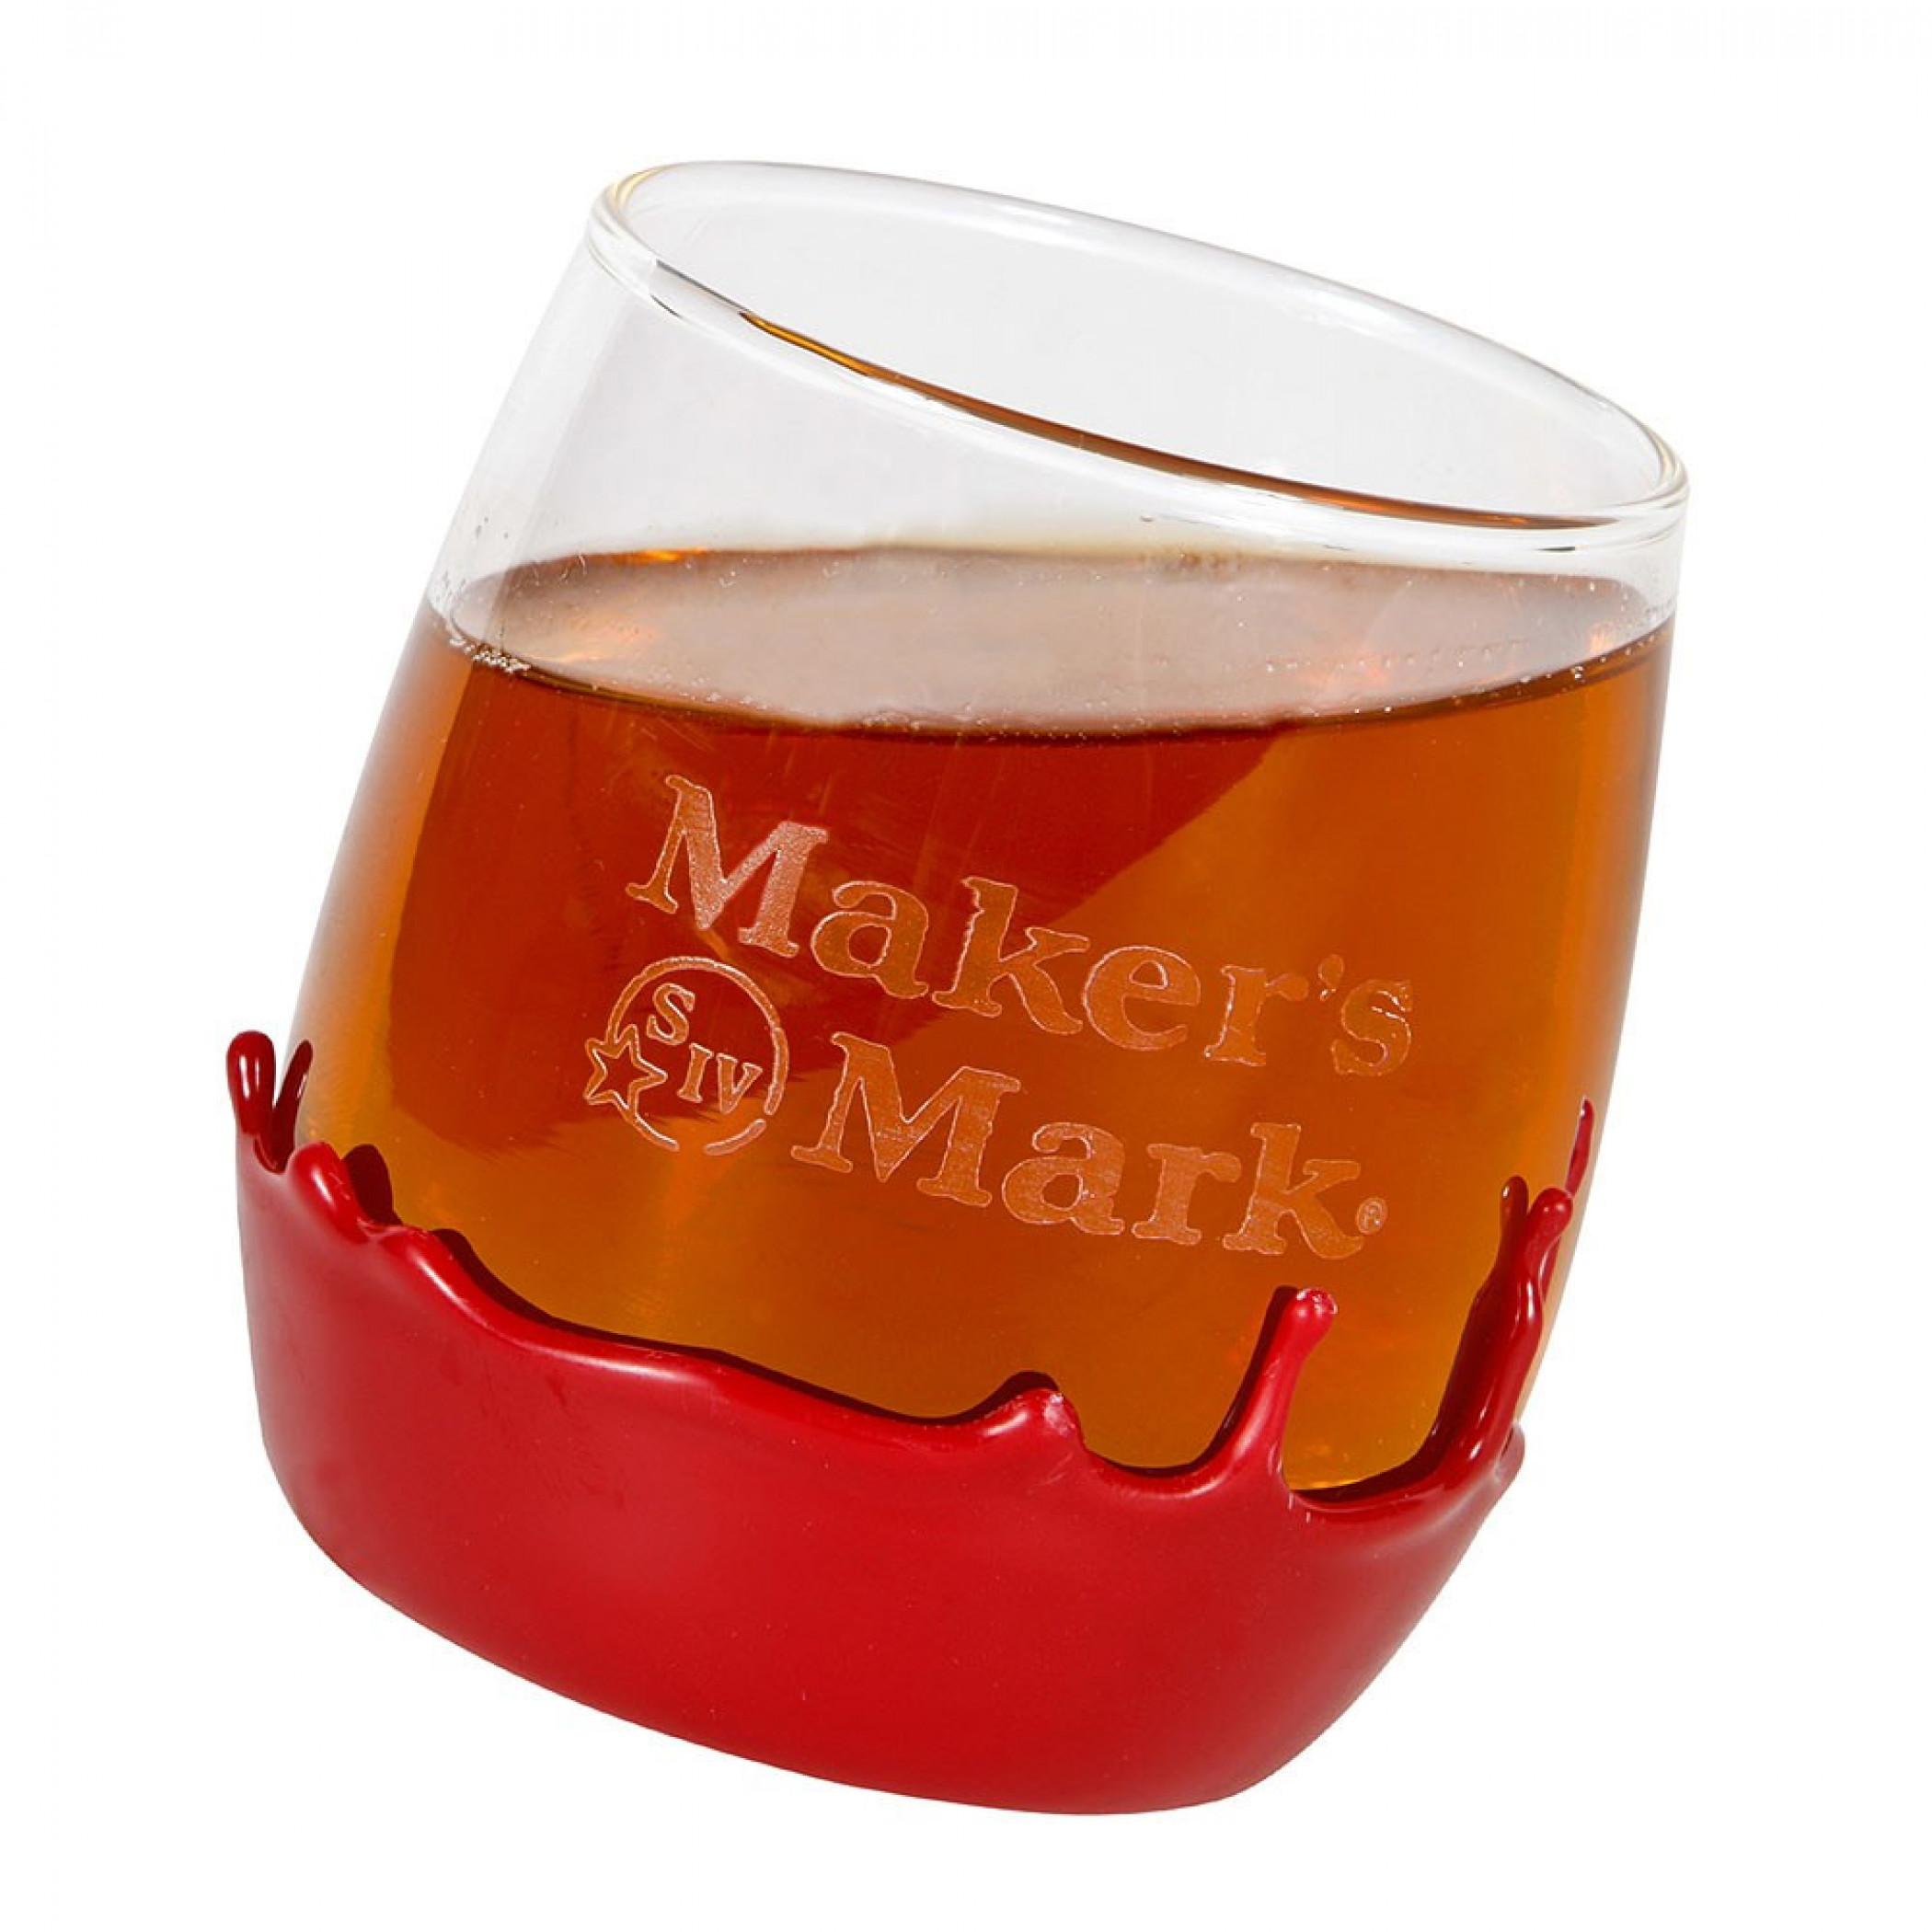 Wax Dipped Maker's Mark Rolling Rocks Glass